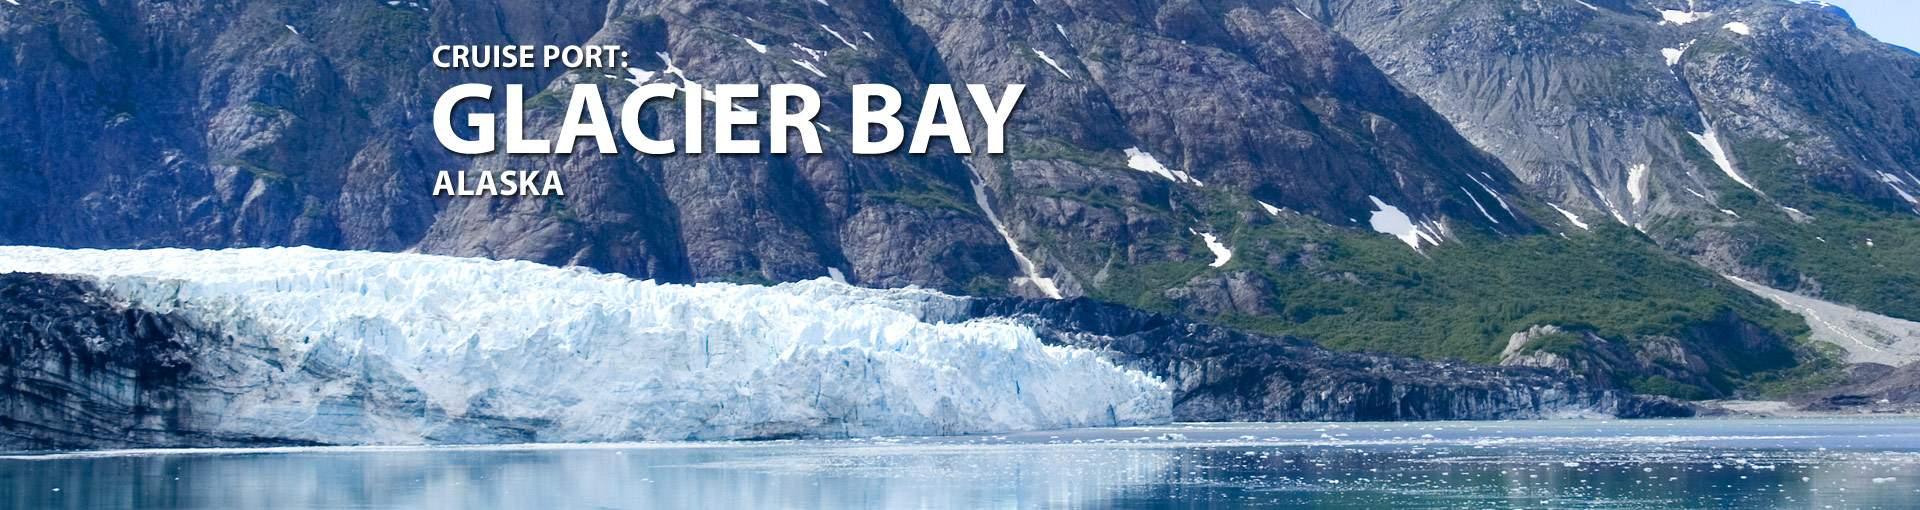 Cruise Port: Glacier Bay, Alaska